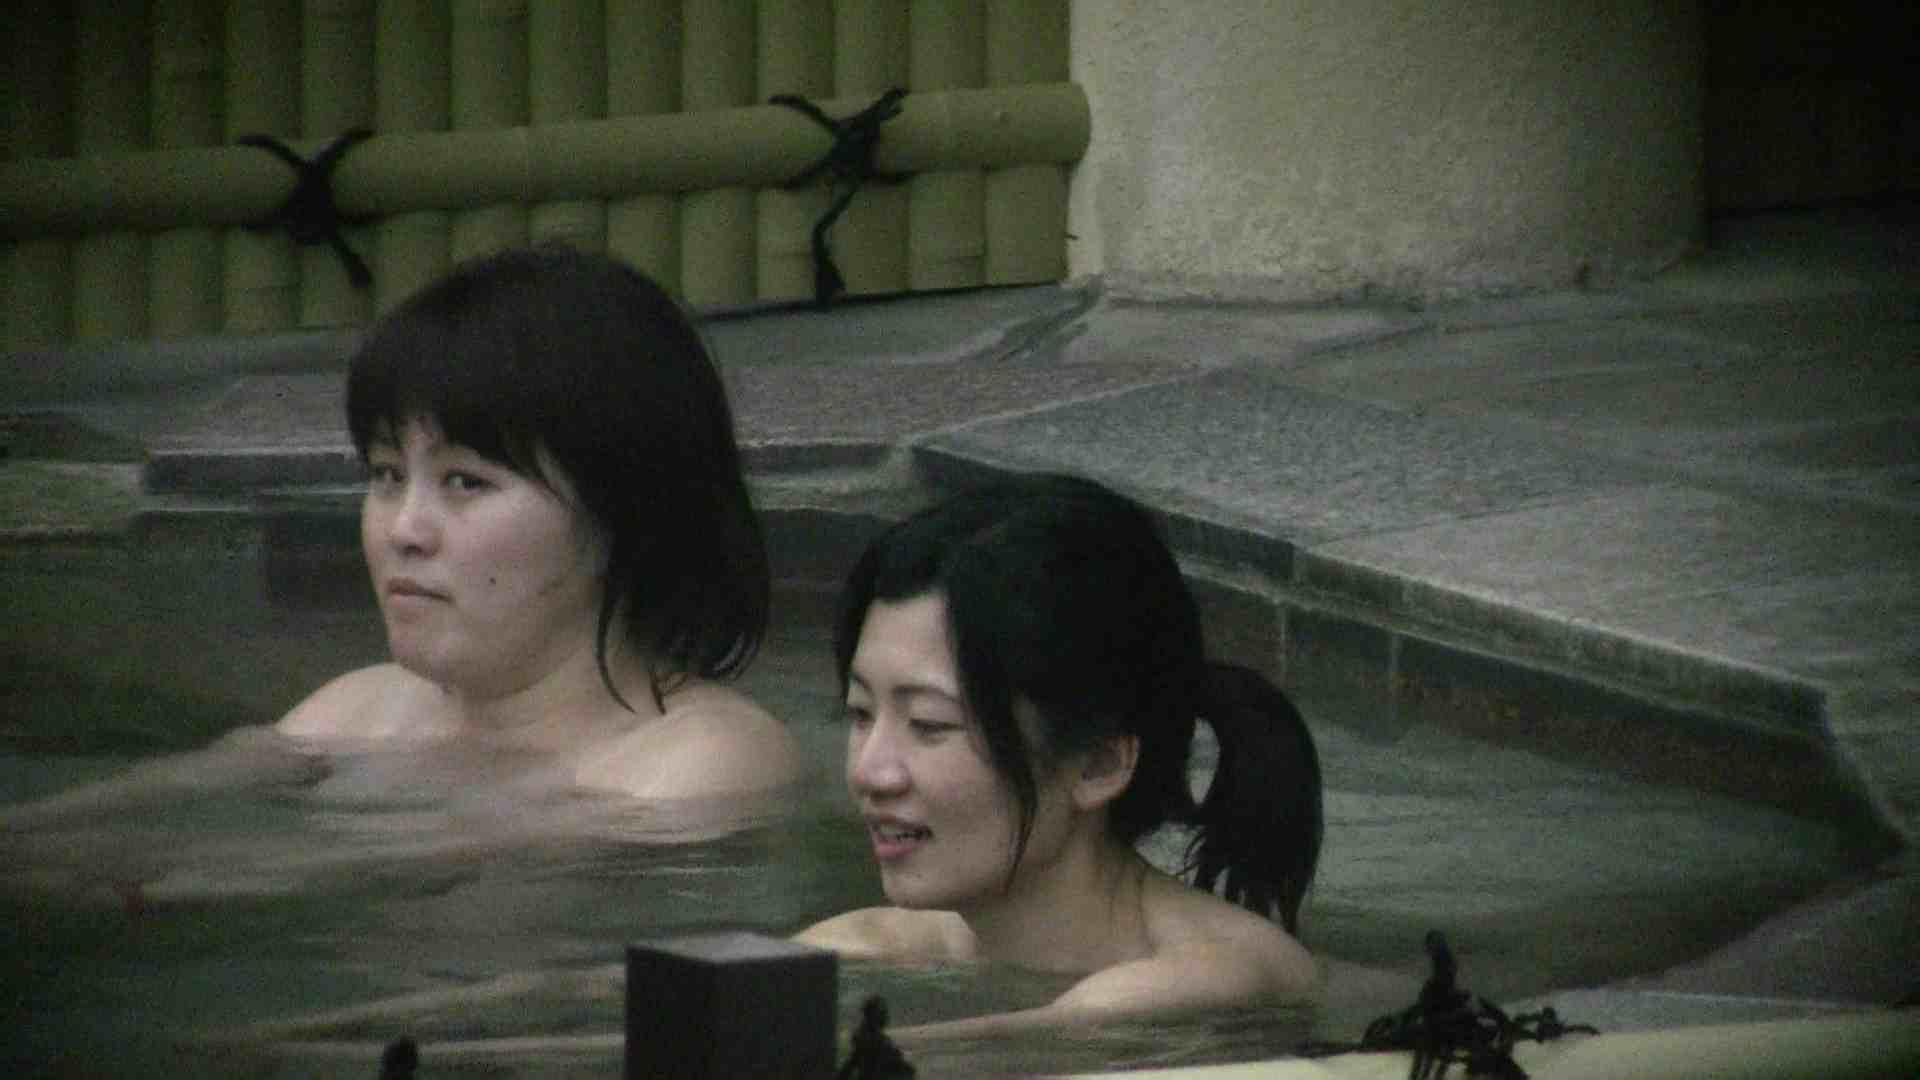 Aquaな露天風呂Vol.539 OL女体 | 露天  88連発 34